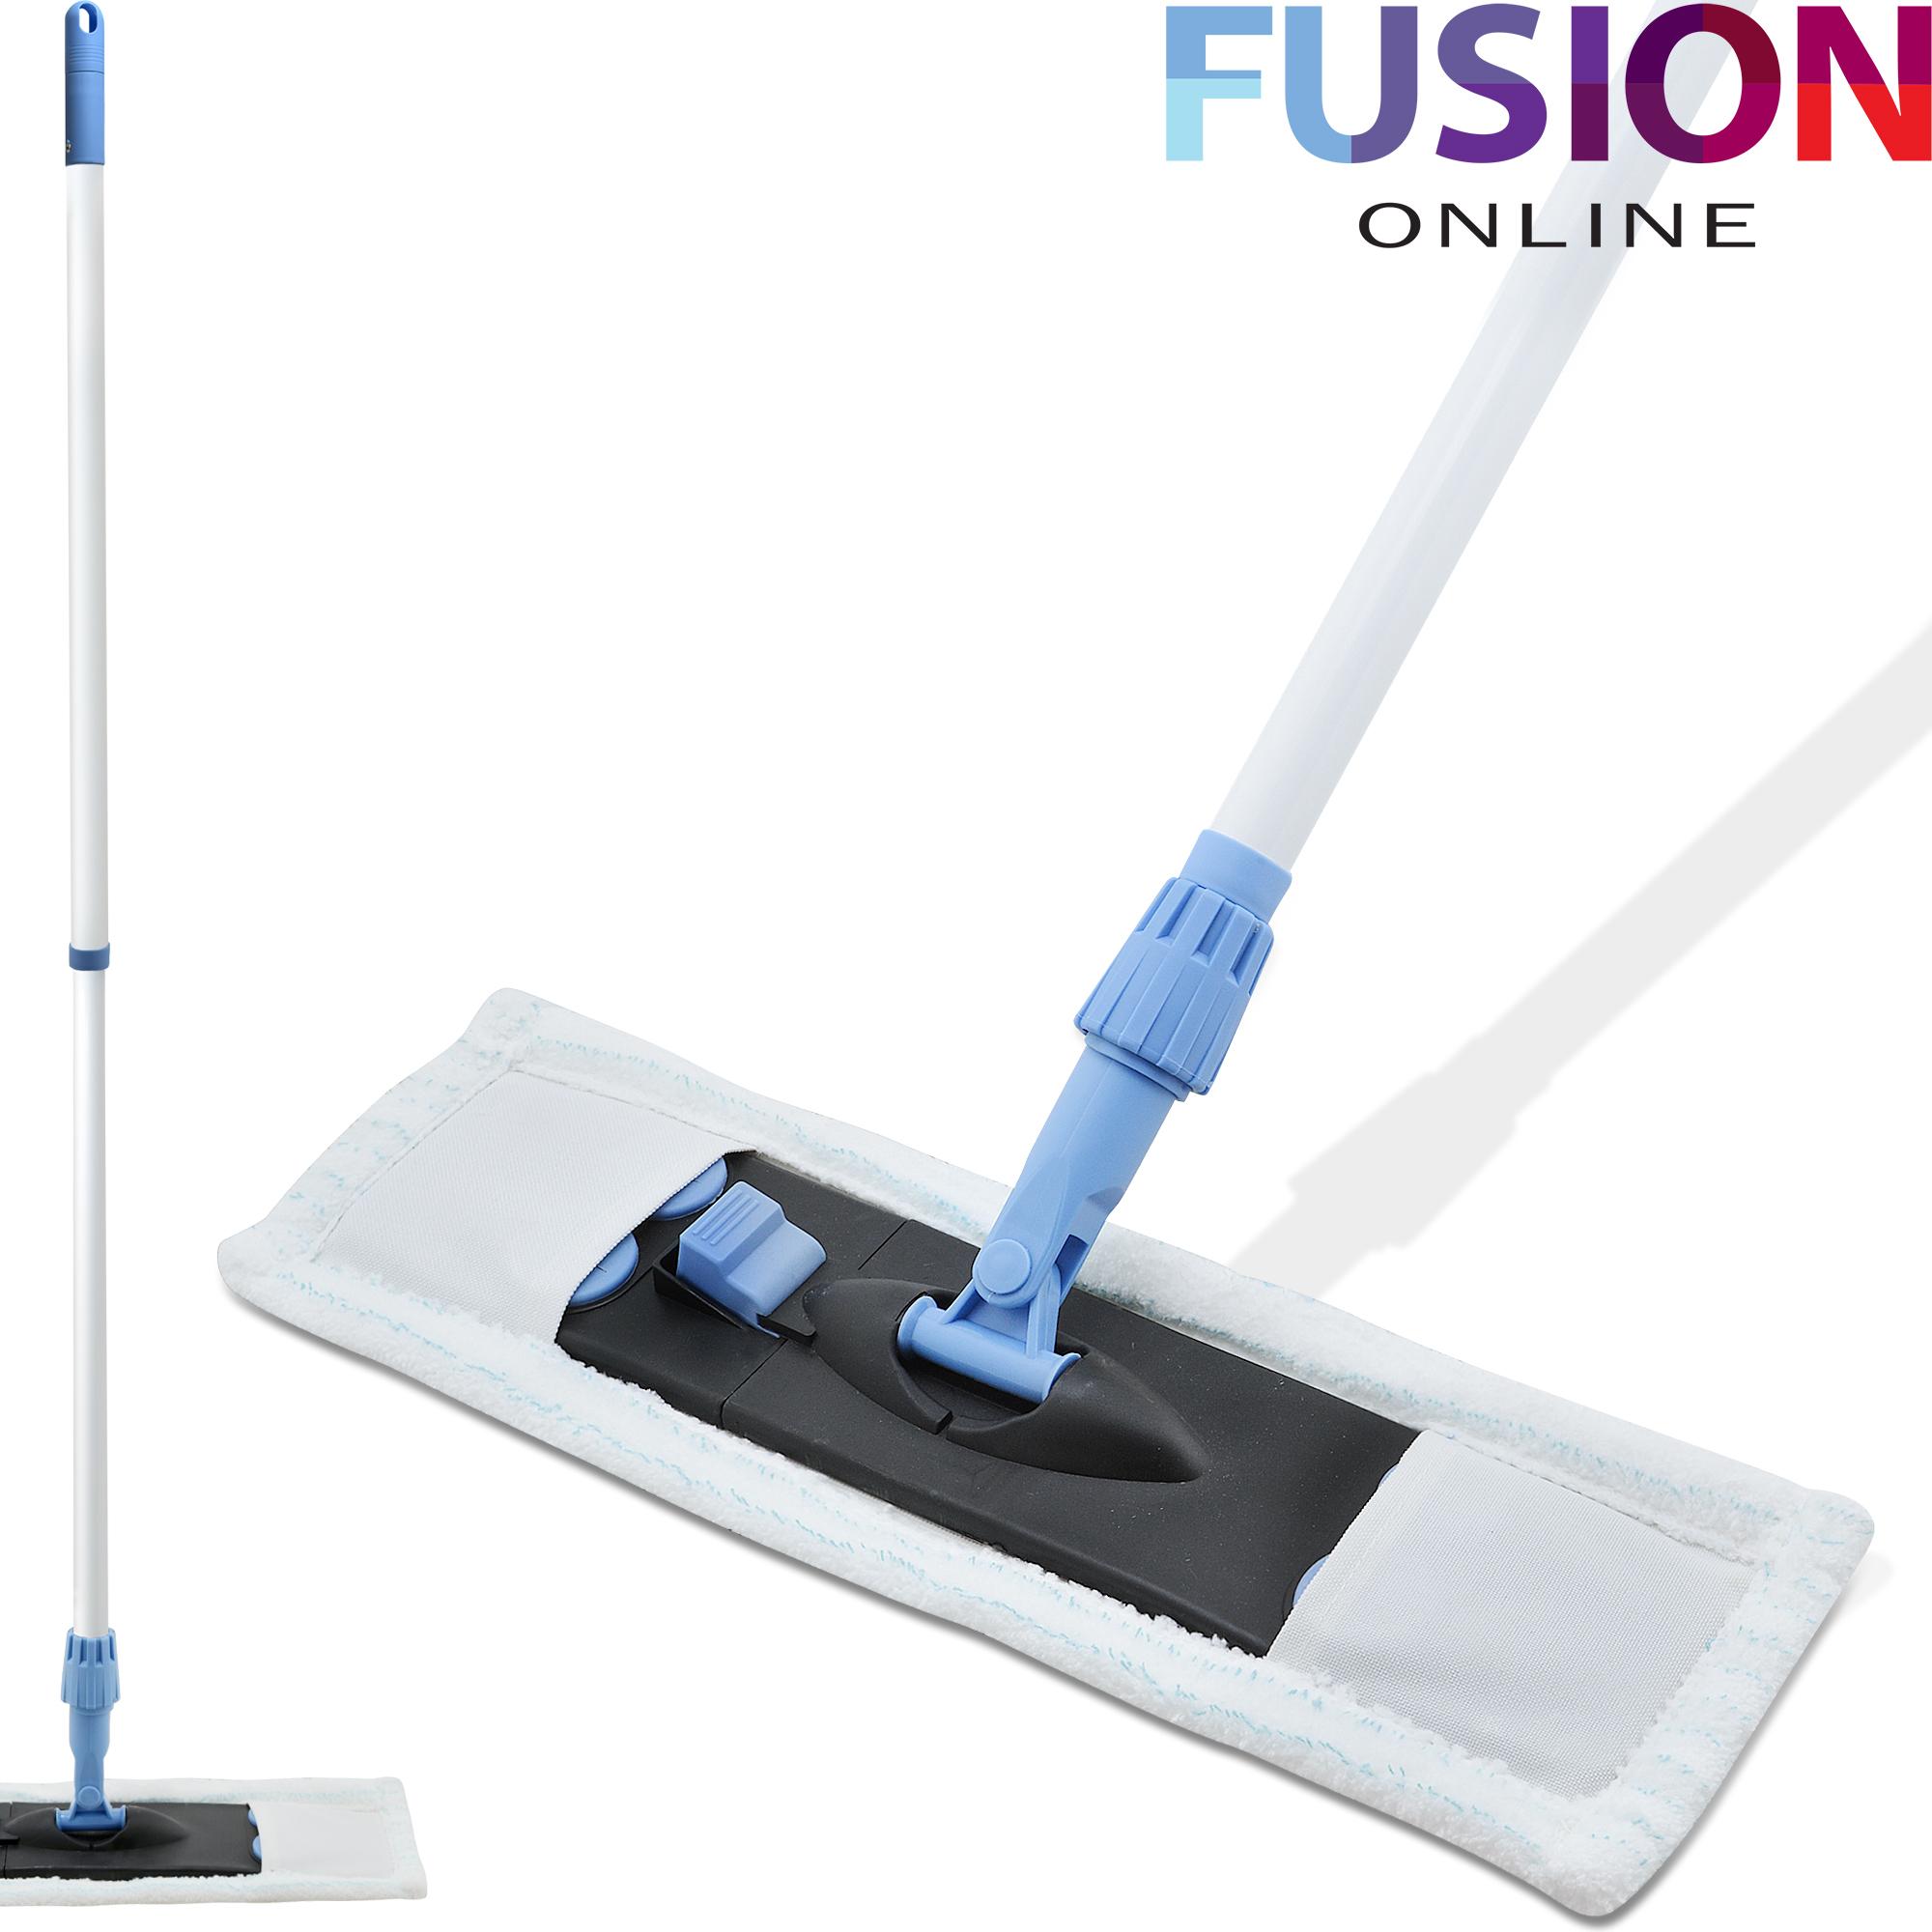 Extendable Microfibre Mop Cleaner Sweeper Tile Floor Wooden Laminate